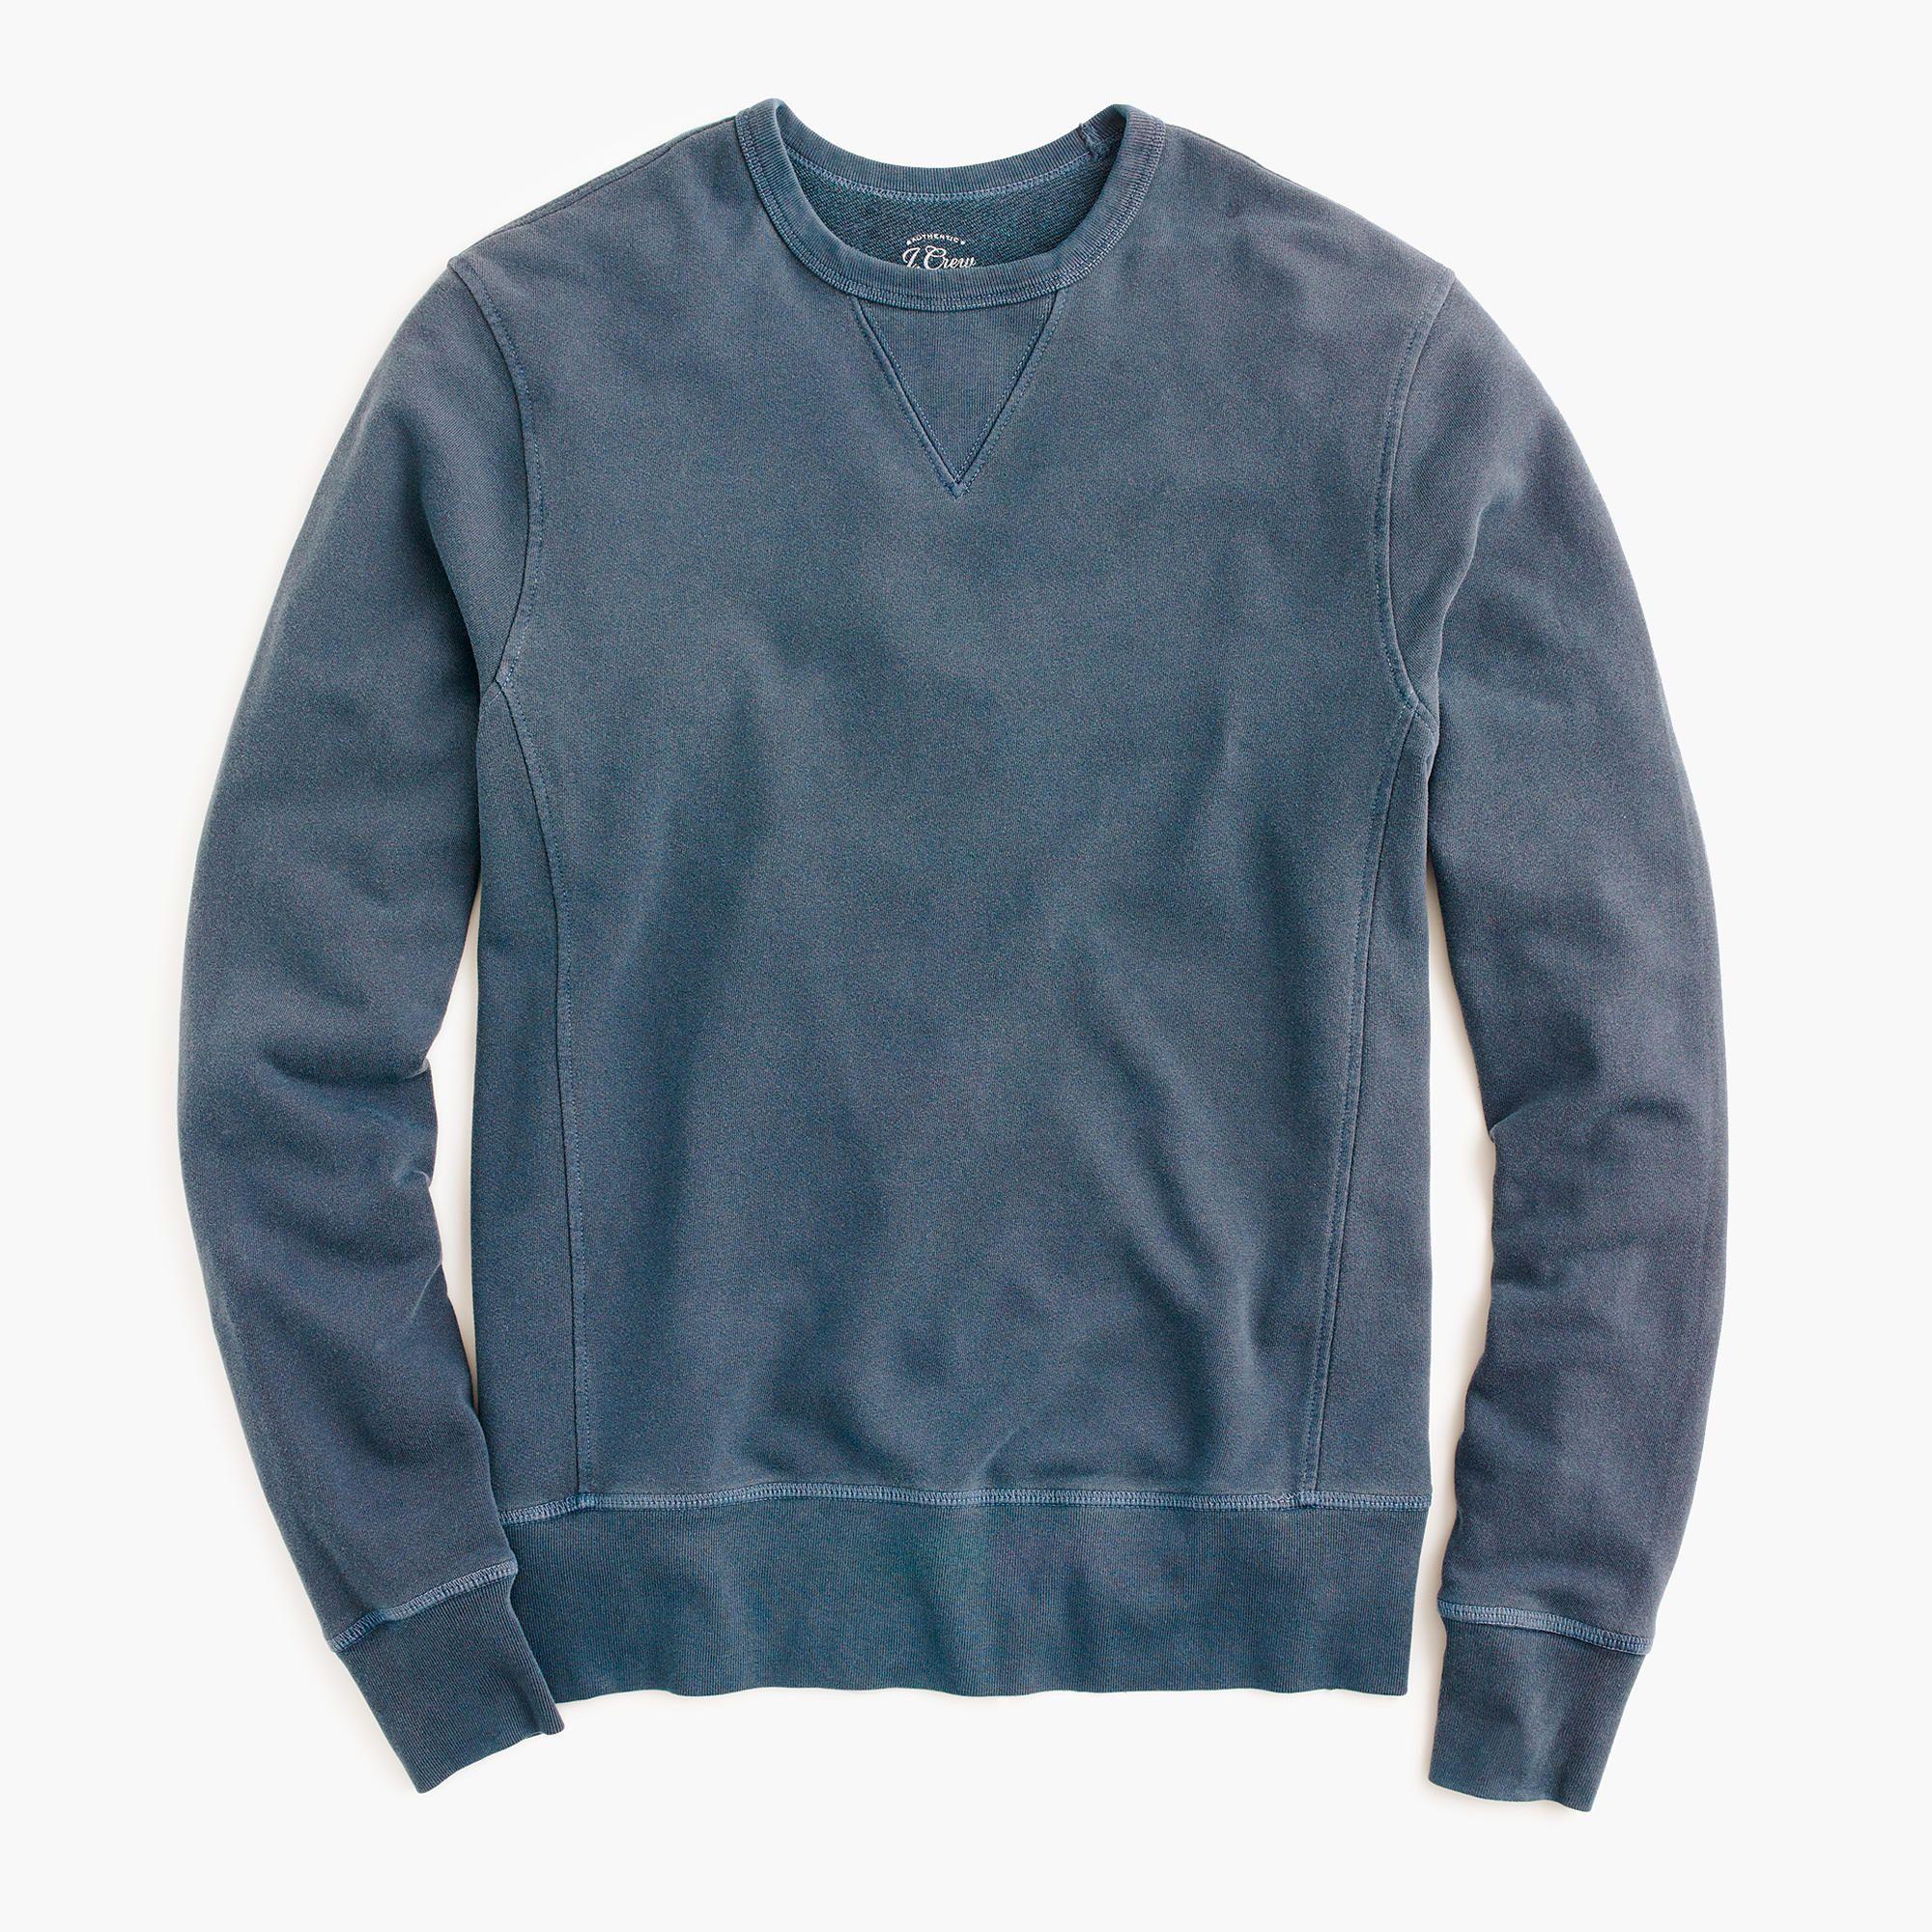 J Crew Garment Dyed Crewneck Sweatshirt Long Sleeve Tshirt Men J Crew Men Crew Neck Sweatshirt [ 2000 x 2000 Pixel ]